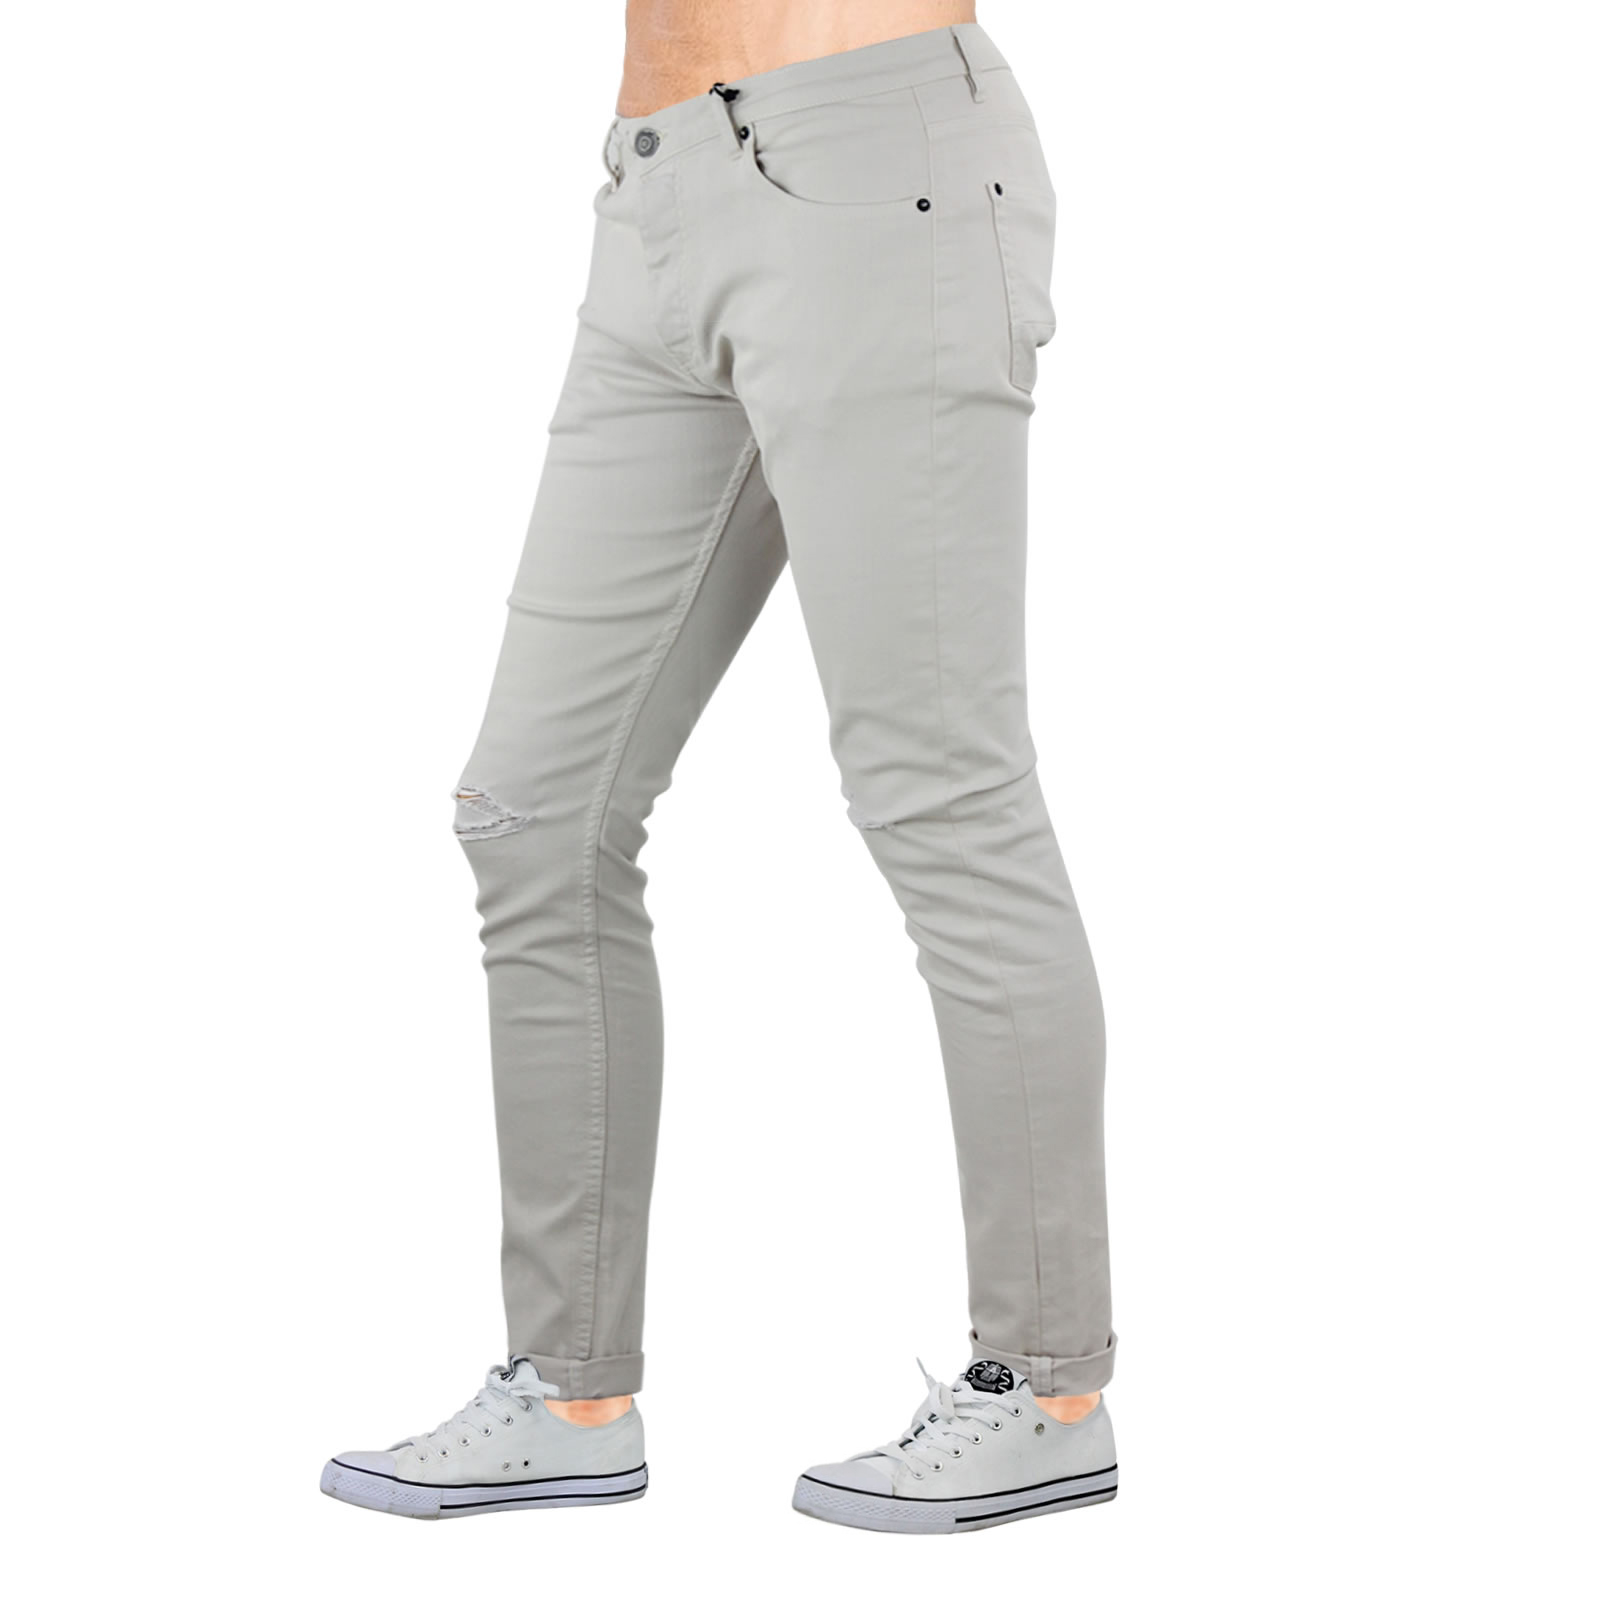 Mens Skinny Jeans Brave Soul Akito Stretch Ripped Roll Up Denim ...